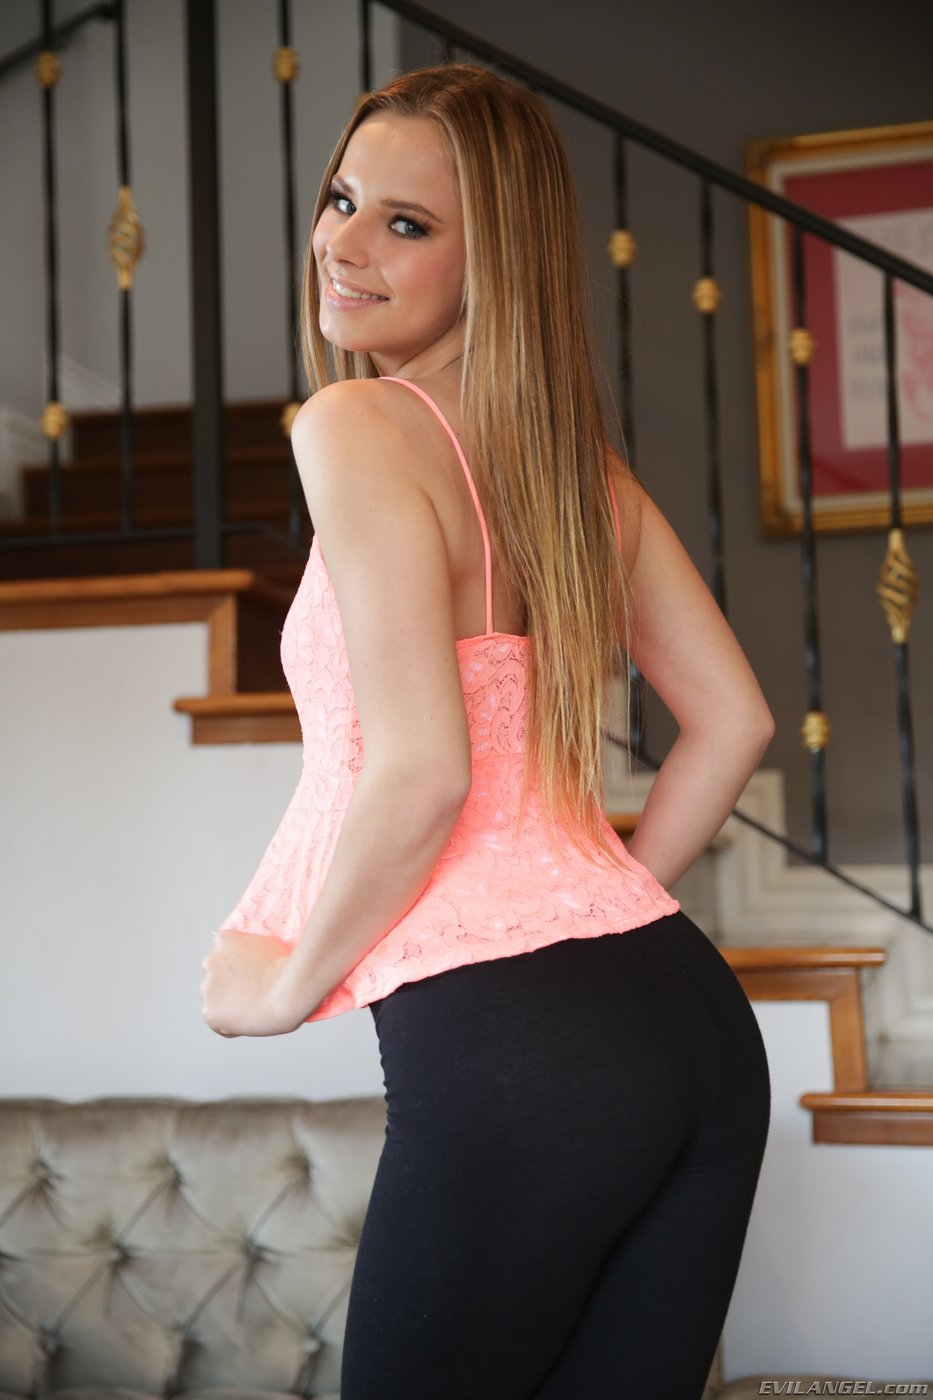 Blonde bombshell Jillian Janson gets on her knees in sexy lingerie for BBC № 166016 без смс